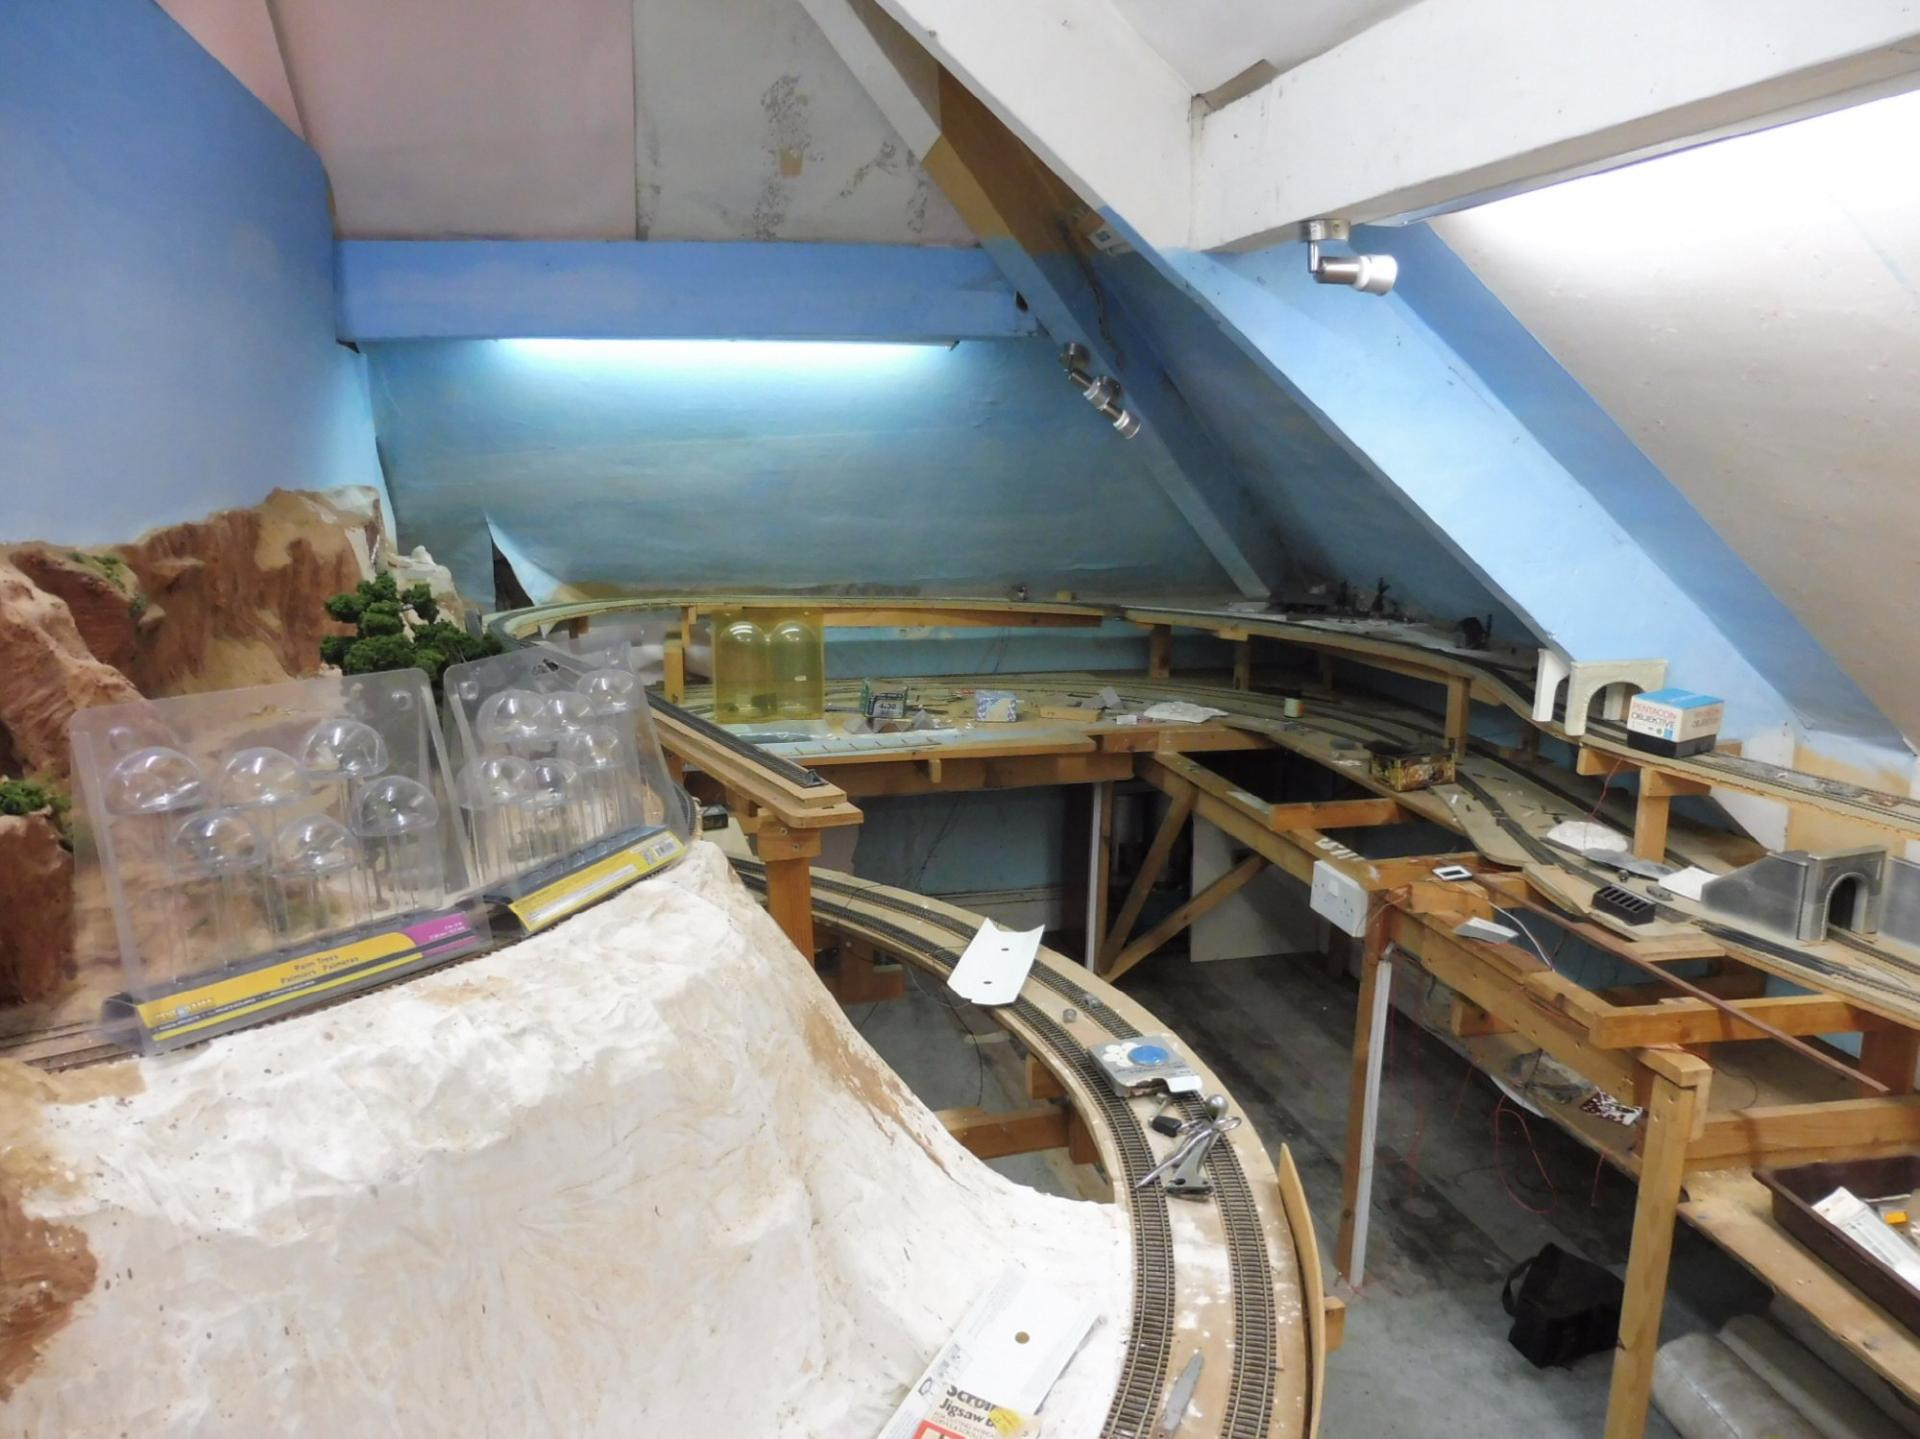 Bedroom detached bungalow for sale in lancaster